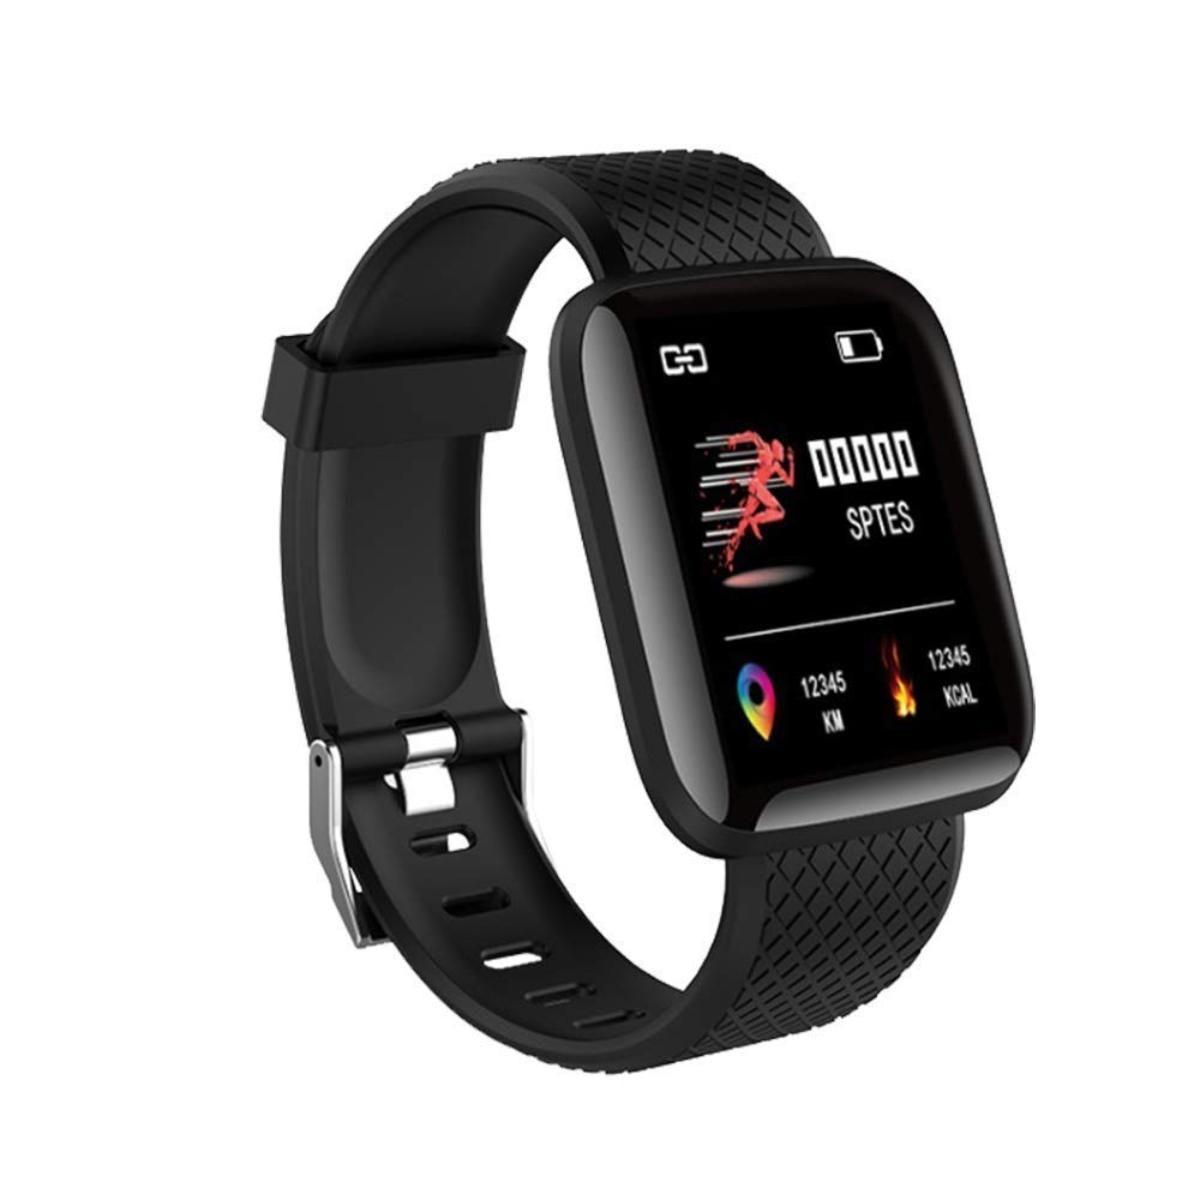 CALPIYO  Wireless Smart Fitness Band